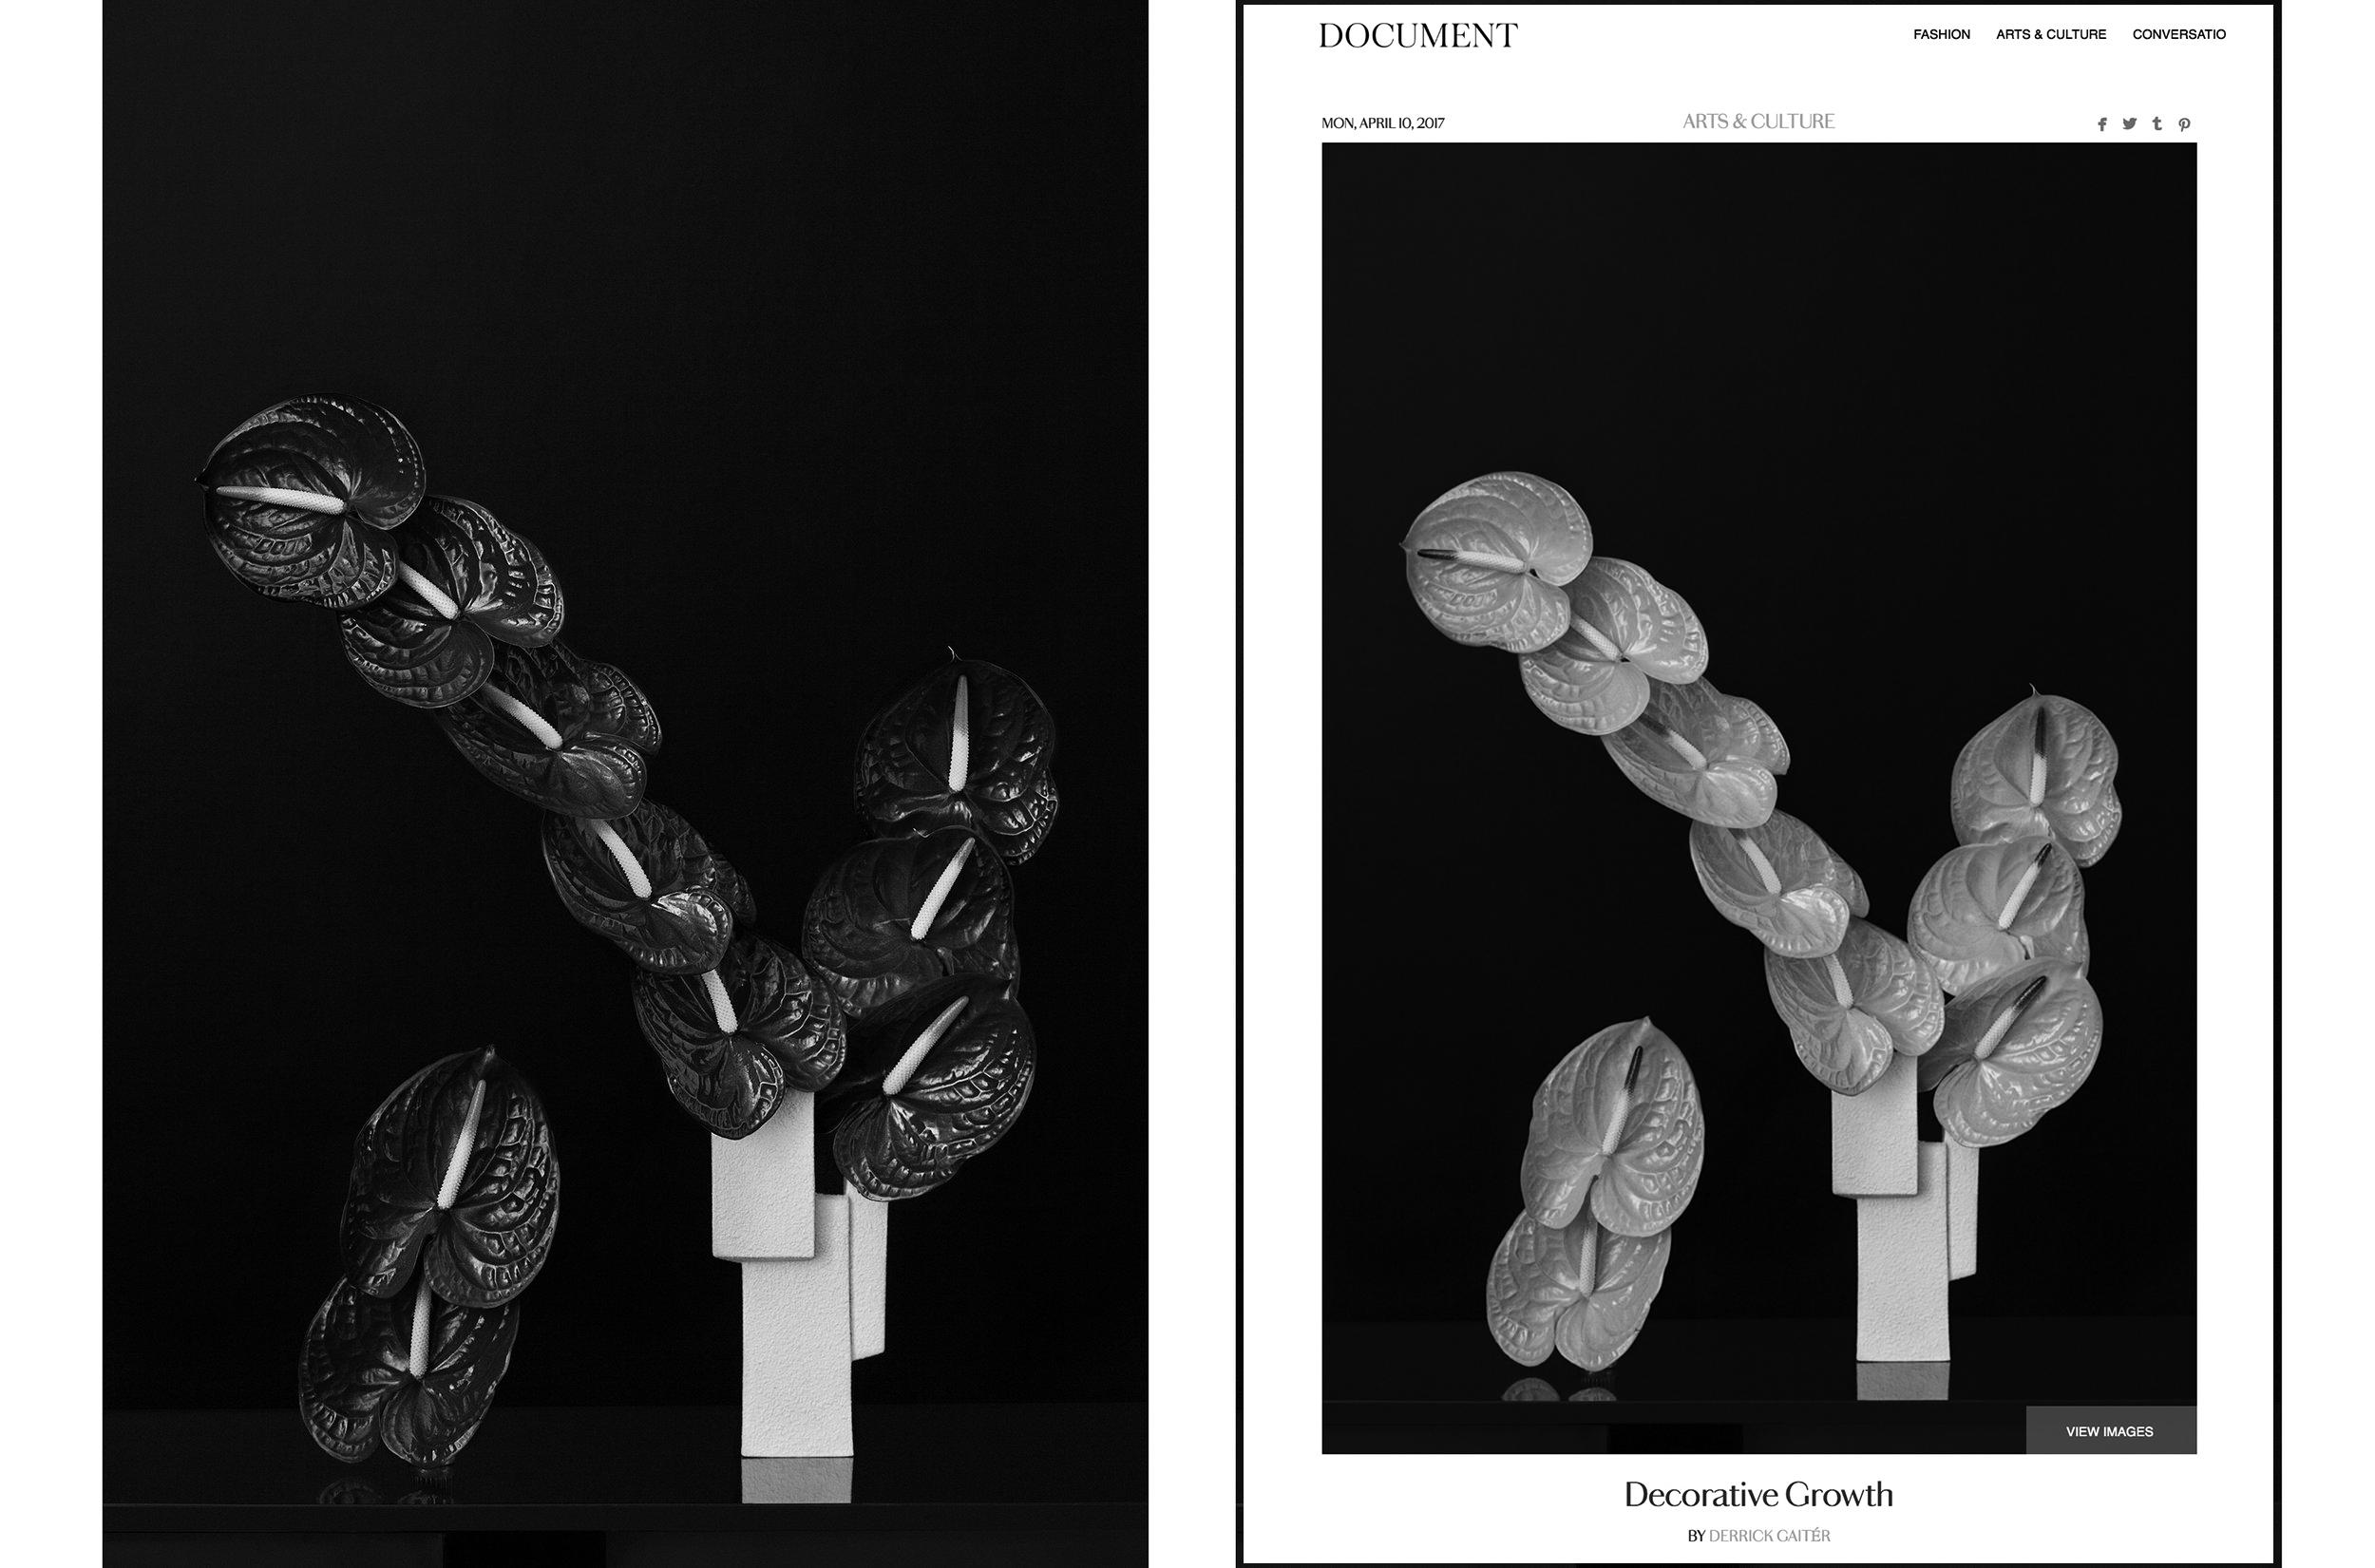 metaflora-ellinor-stigle-document-journal-marisa-competello